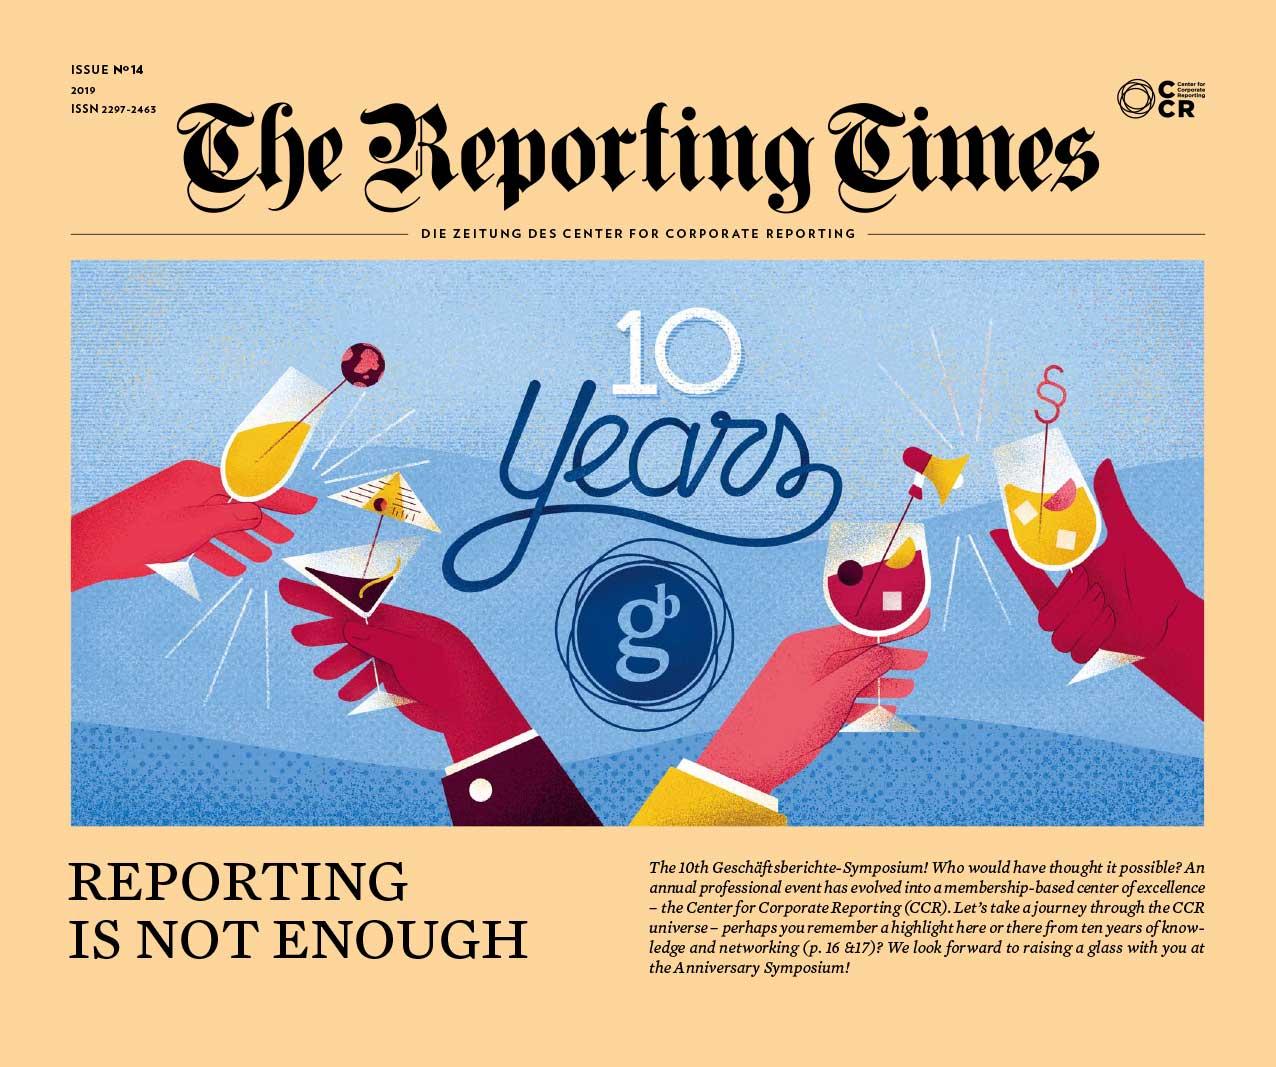 CCR_Reporting_Times_14_190517_Reduziert.jpg